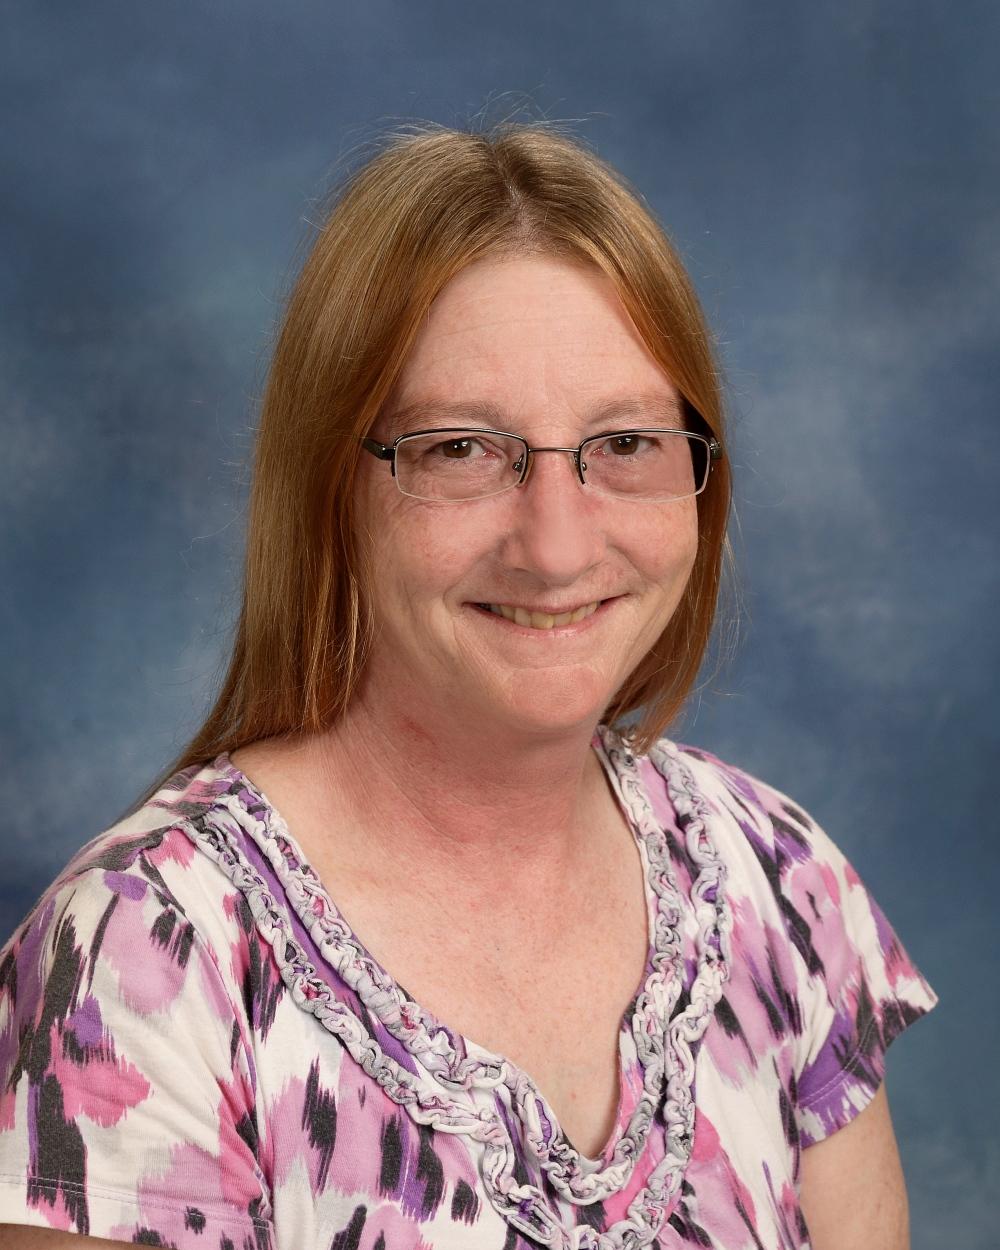 Sue Hassett, Nursery Caregiver